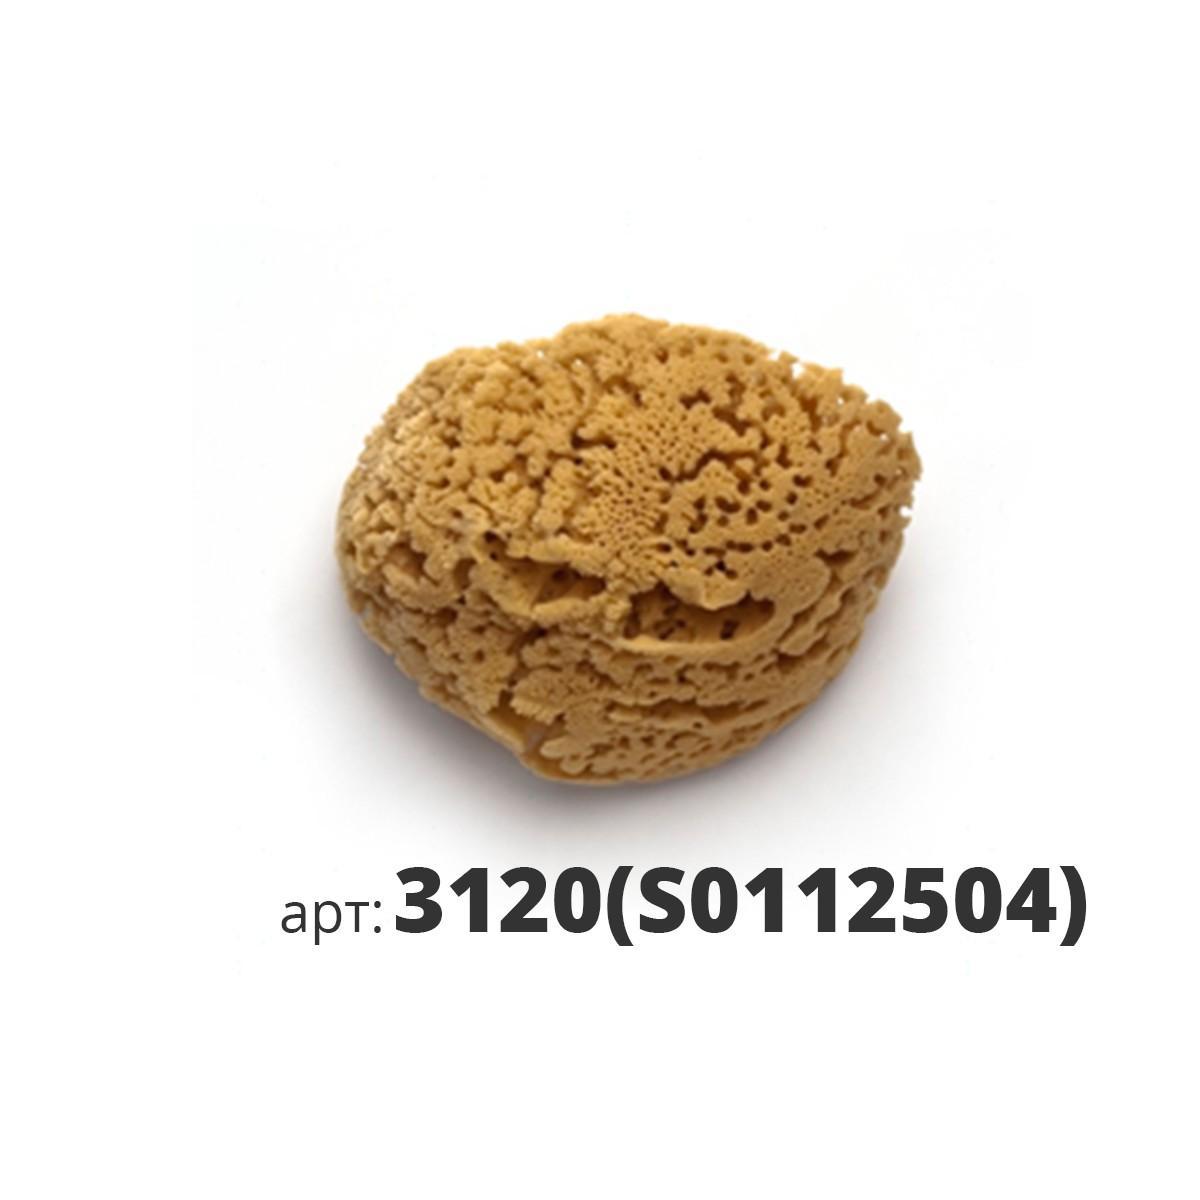 PAVAN натуральная губка морская 3120(S0112504)